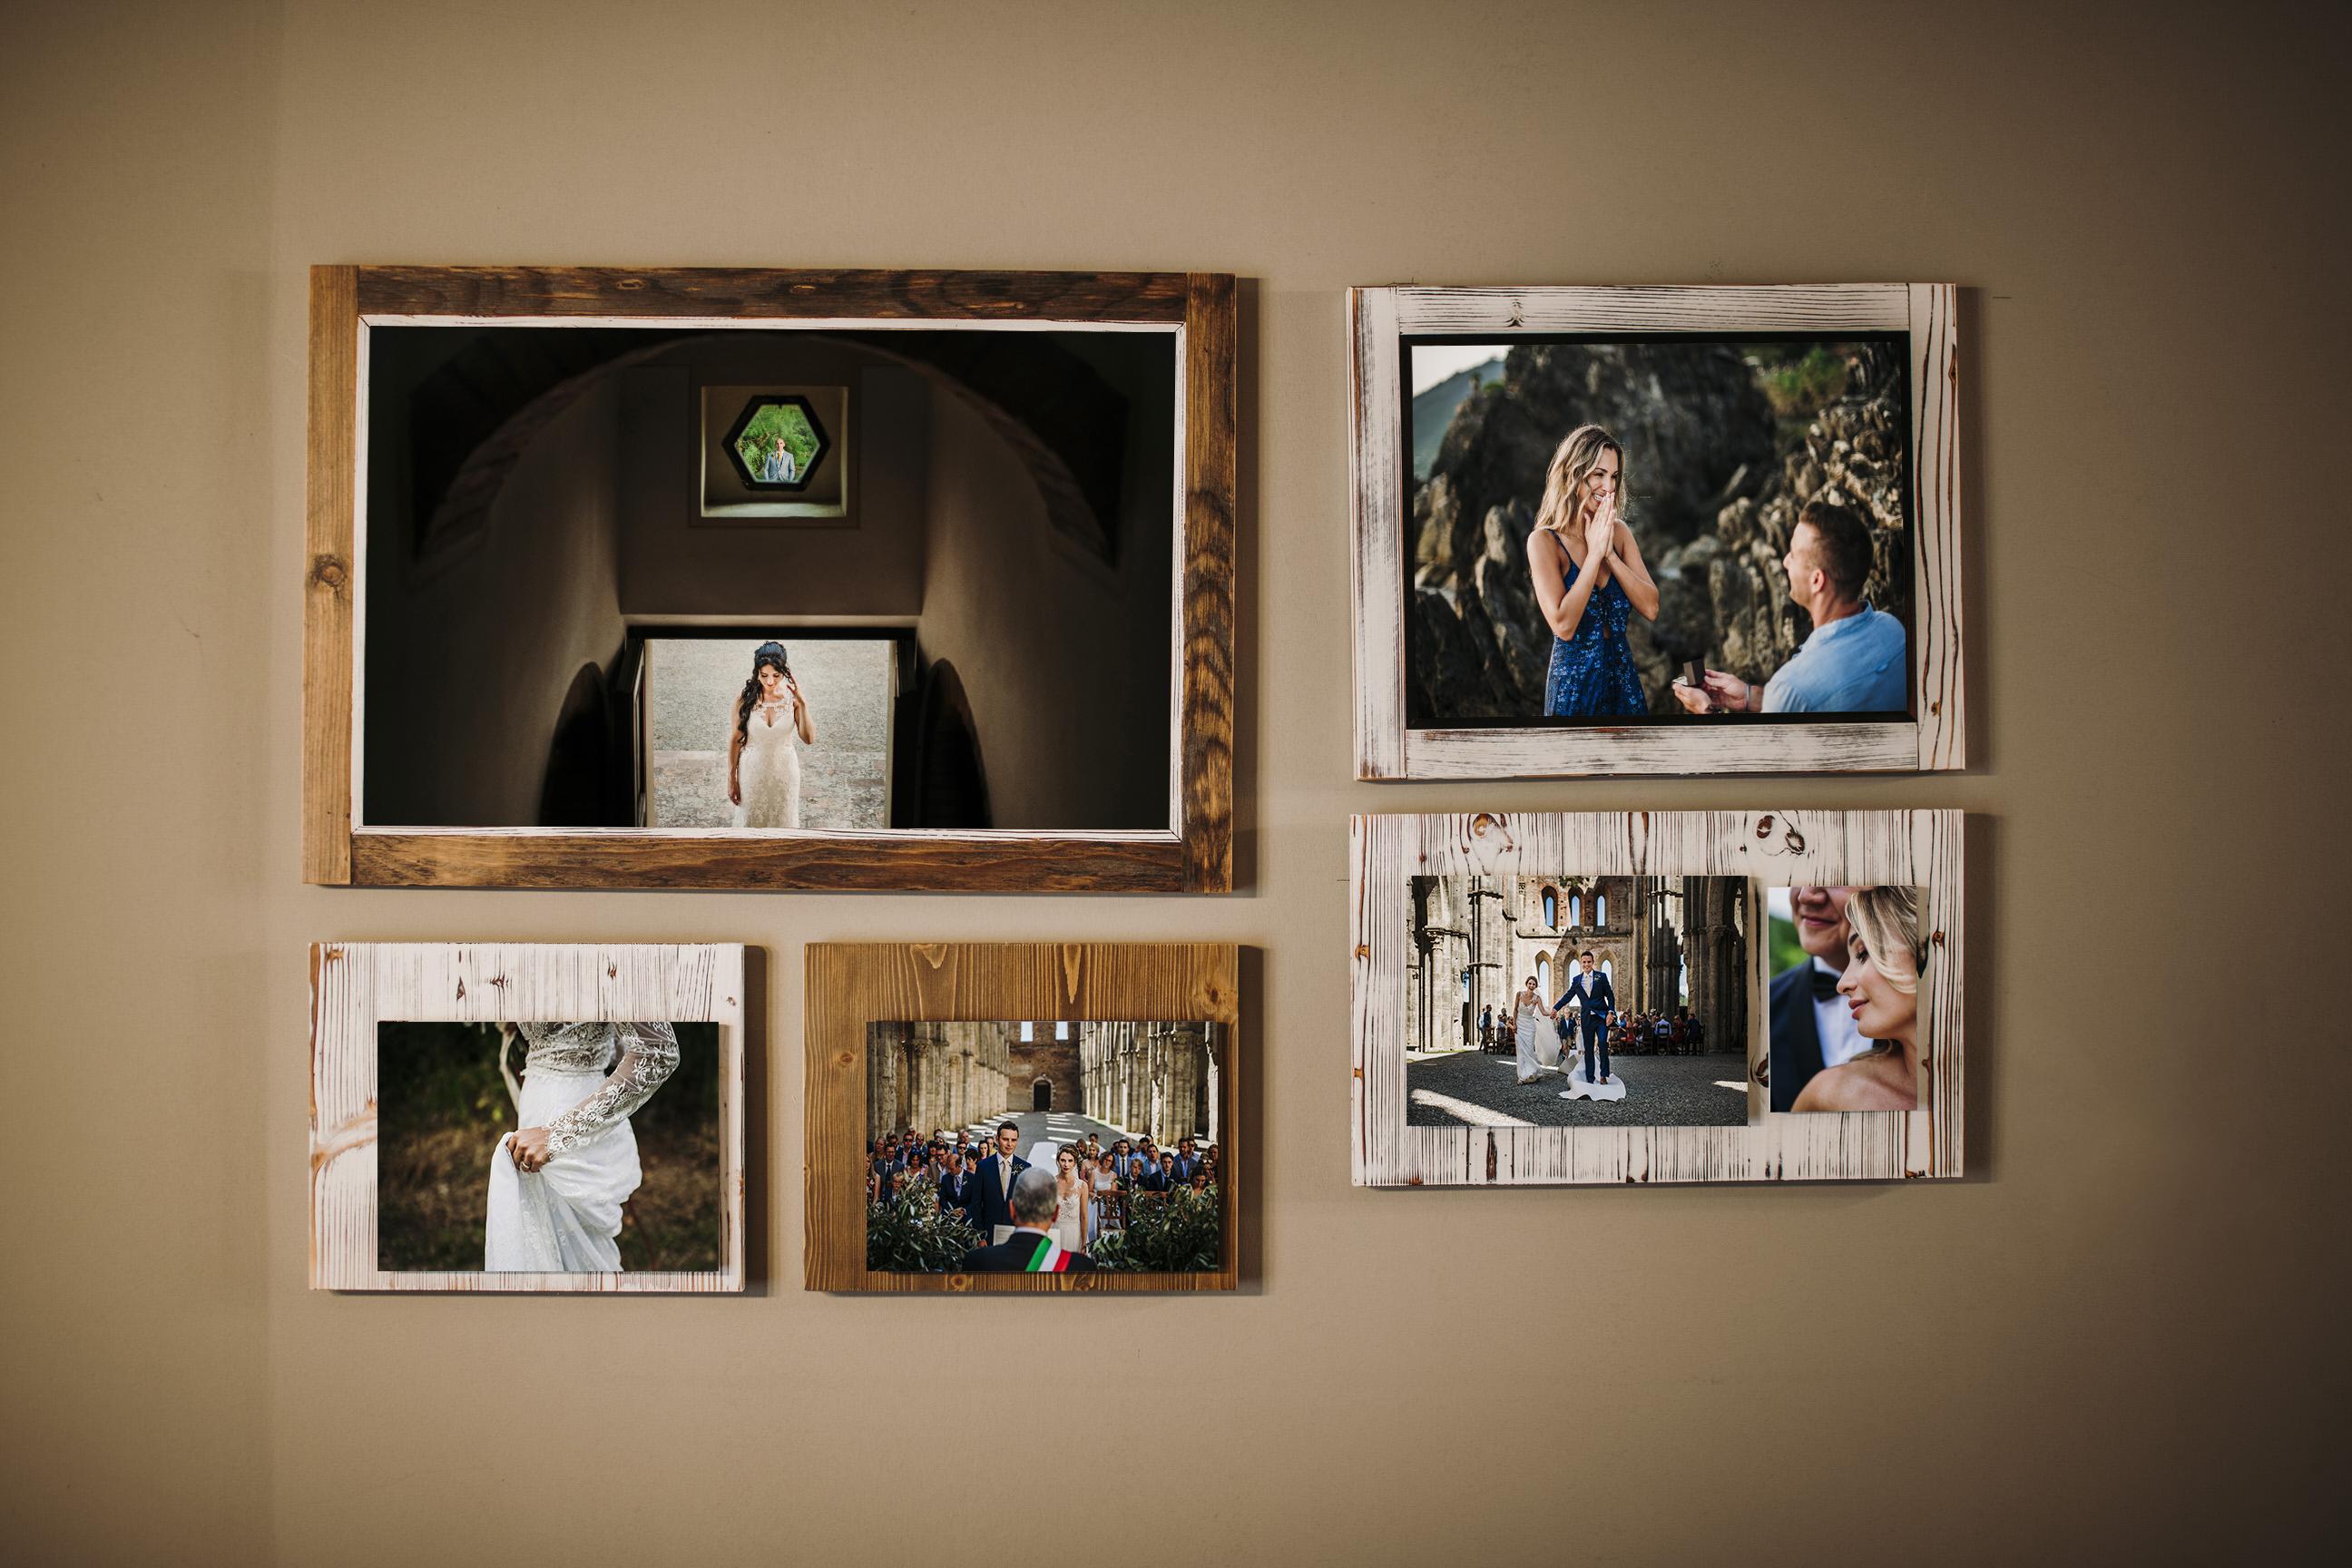 Wedding-photographer-tuscany-italy-siena-chianti4